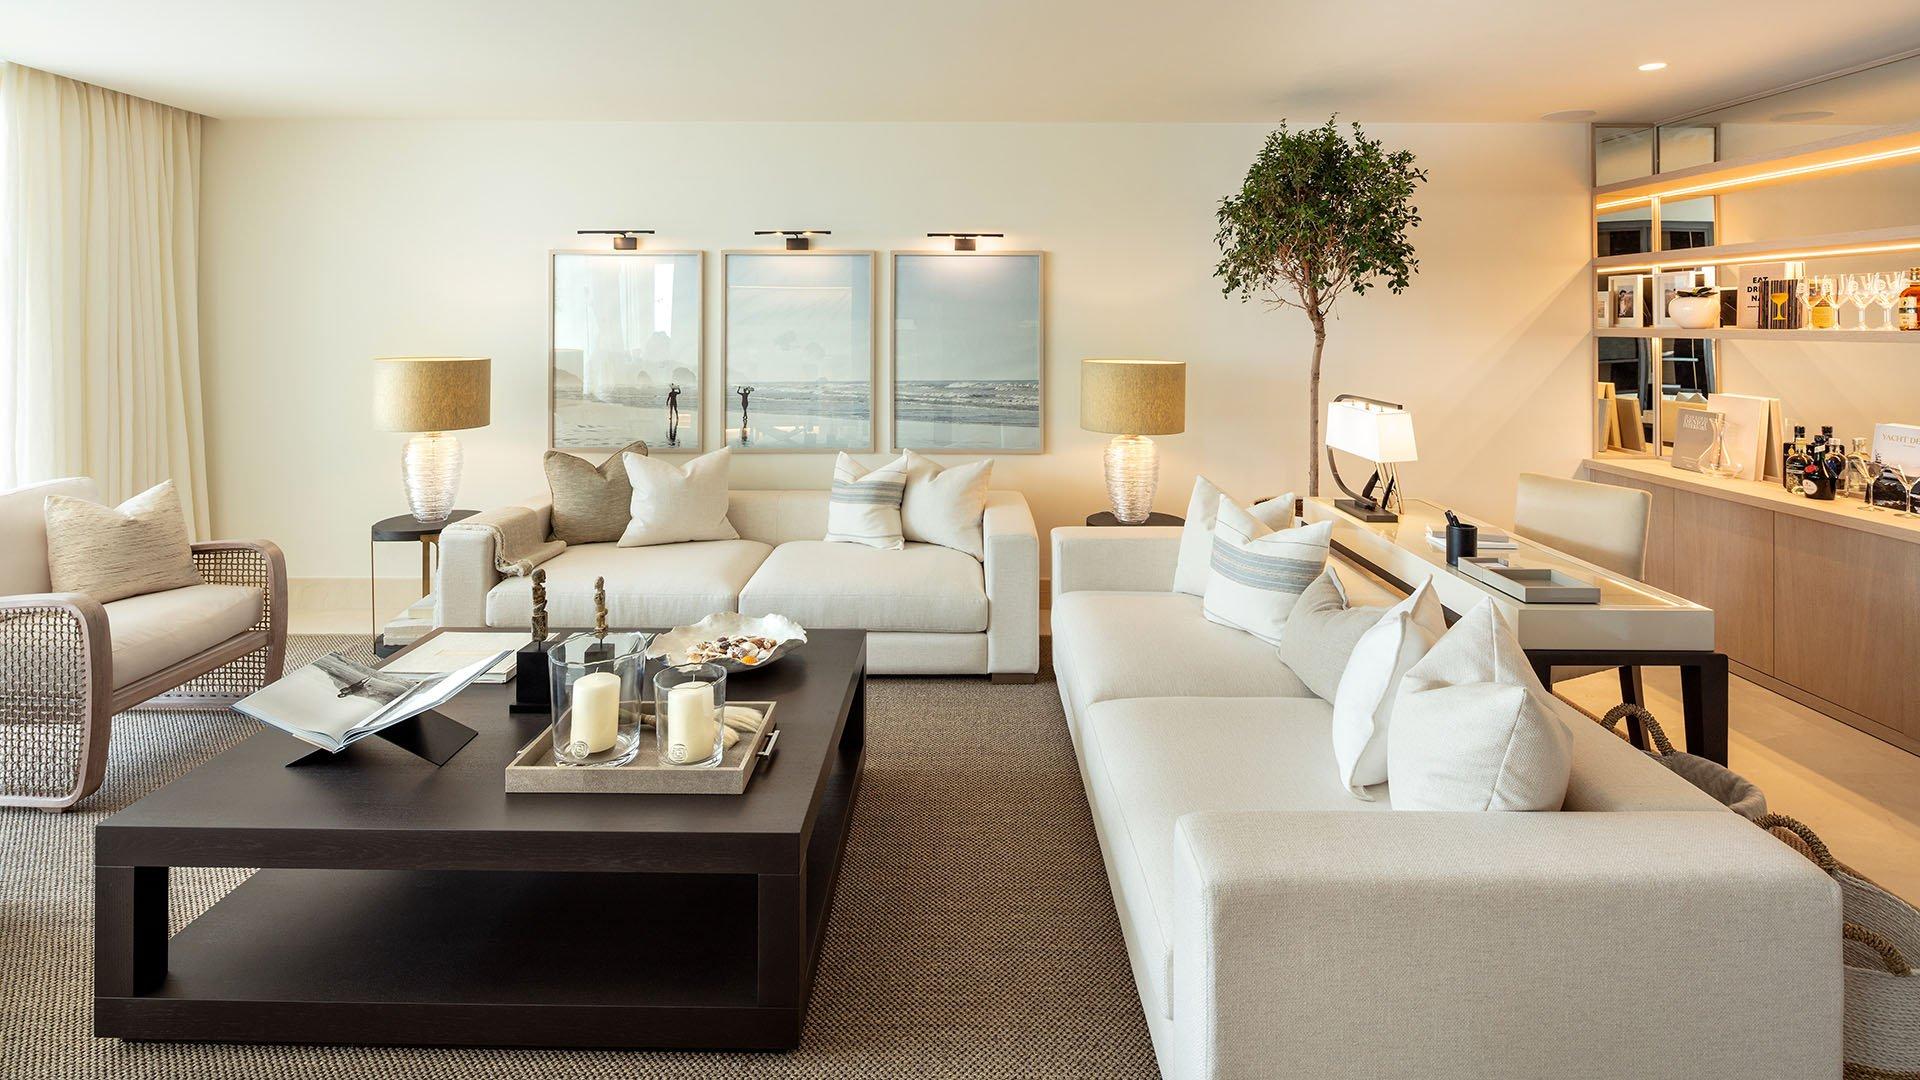 Puente Romano 2: Apartment in the beachfront resort of Puente Romano, Marbella Golden Mile